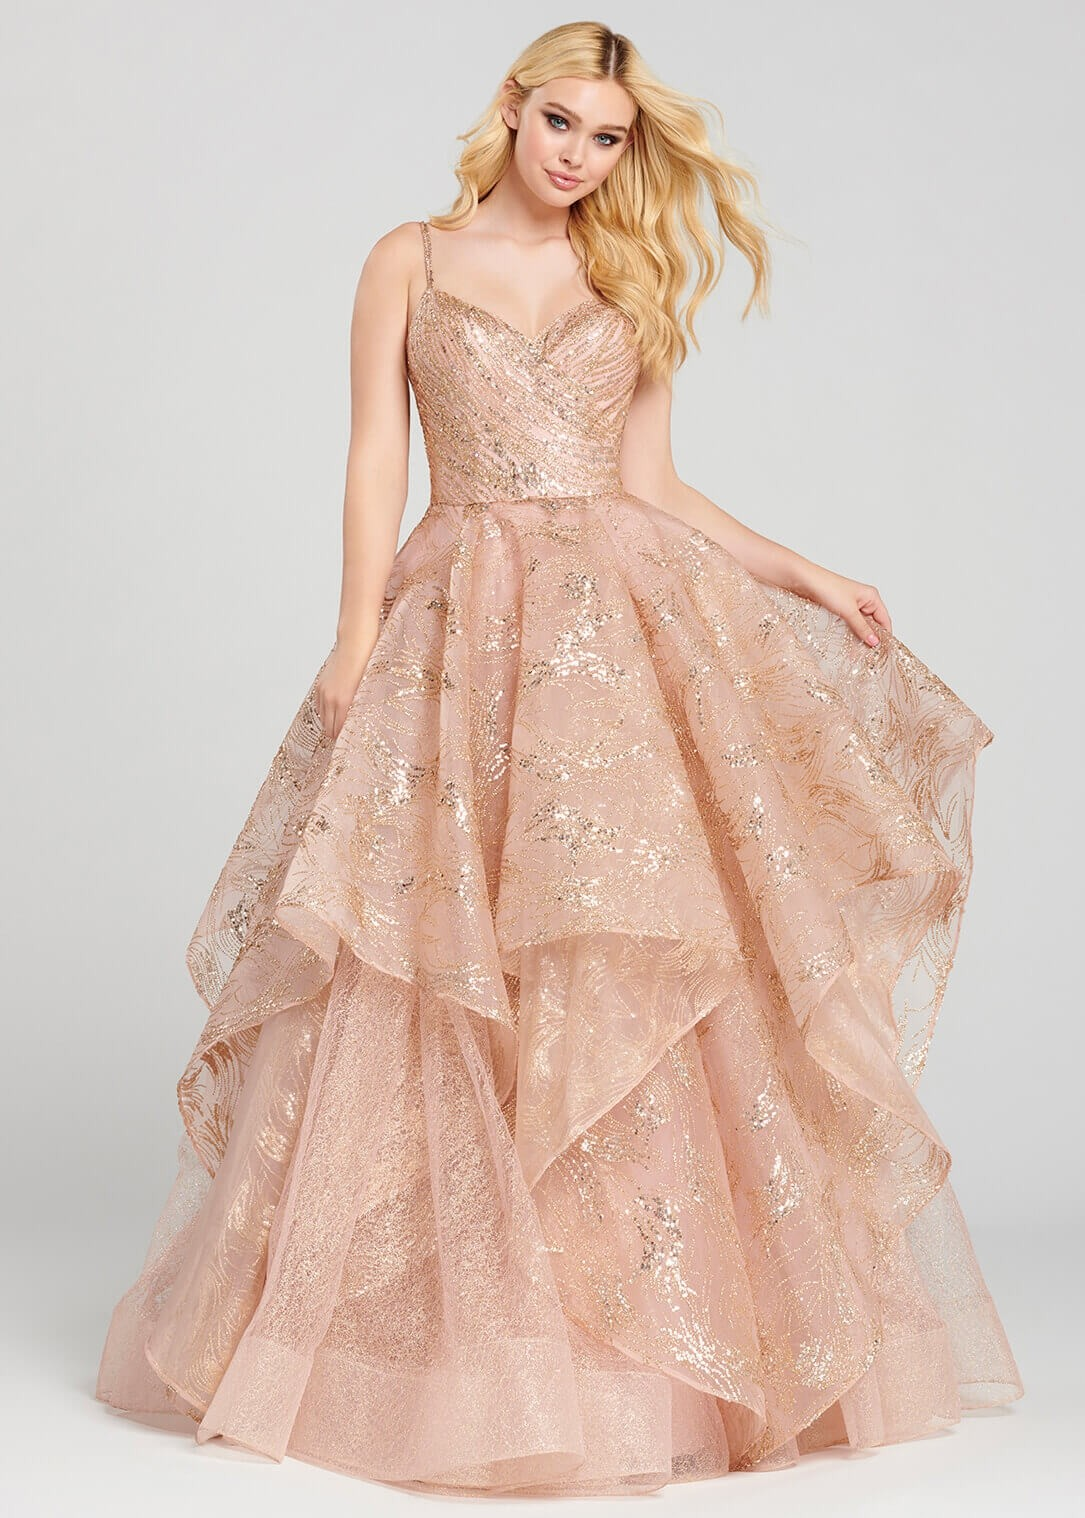 Ellie Wilde EW120005 Rose Gold Glitter Ball Gown